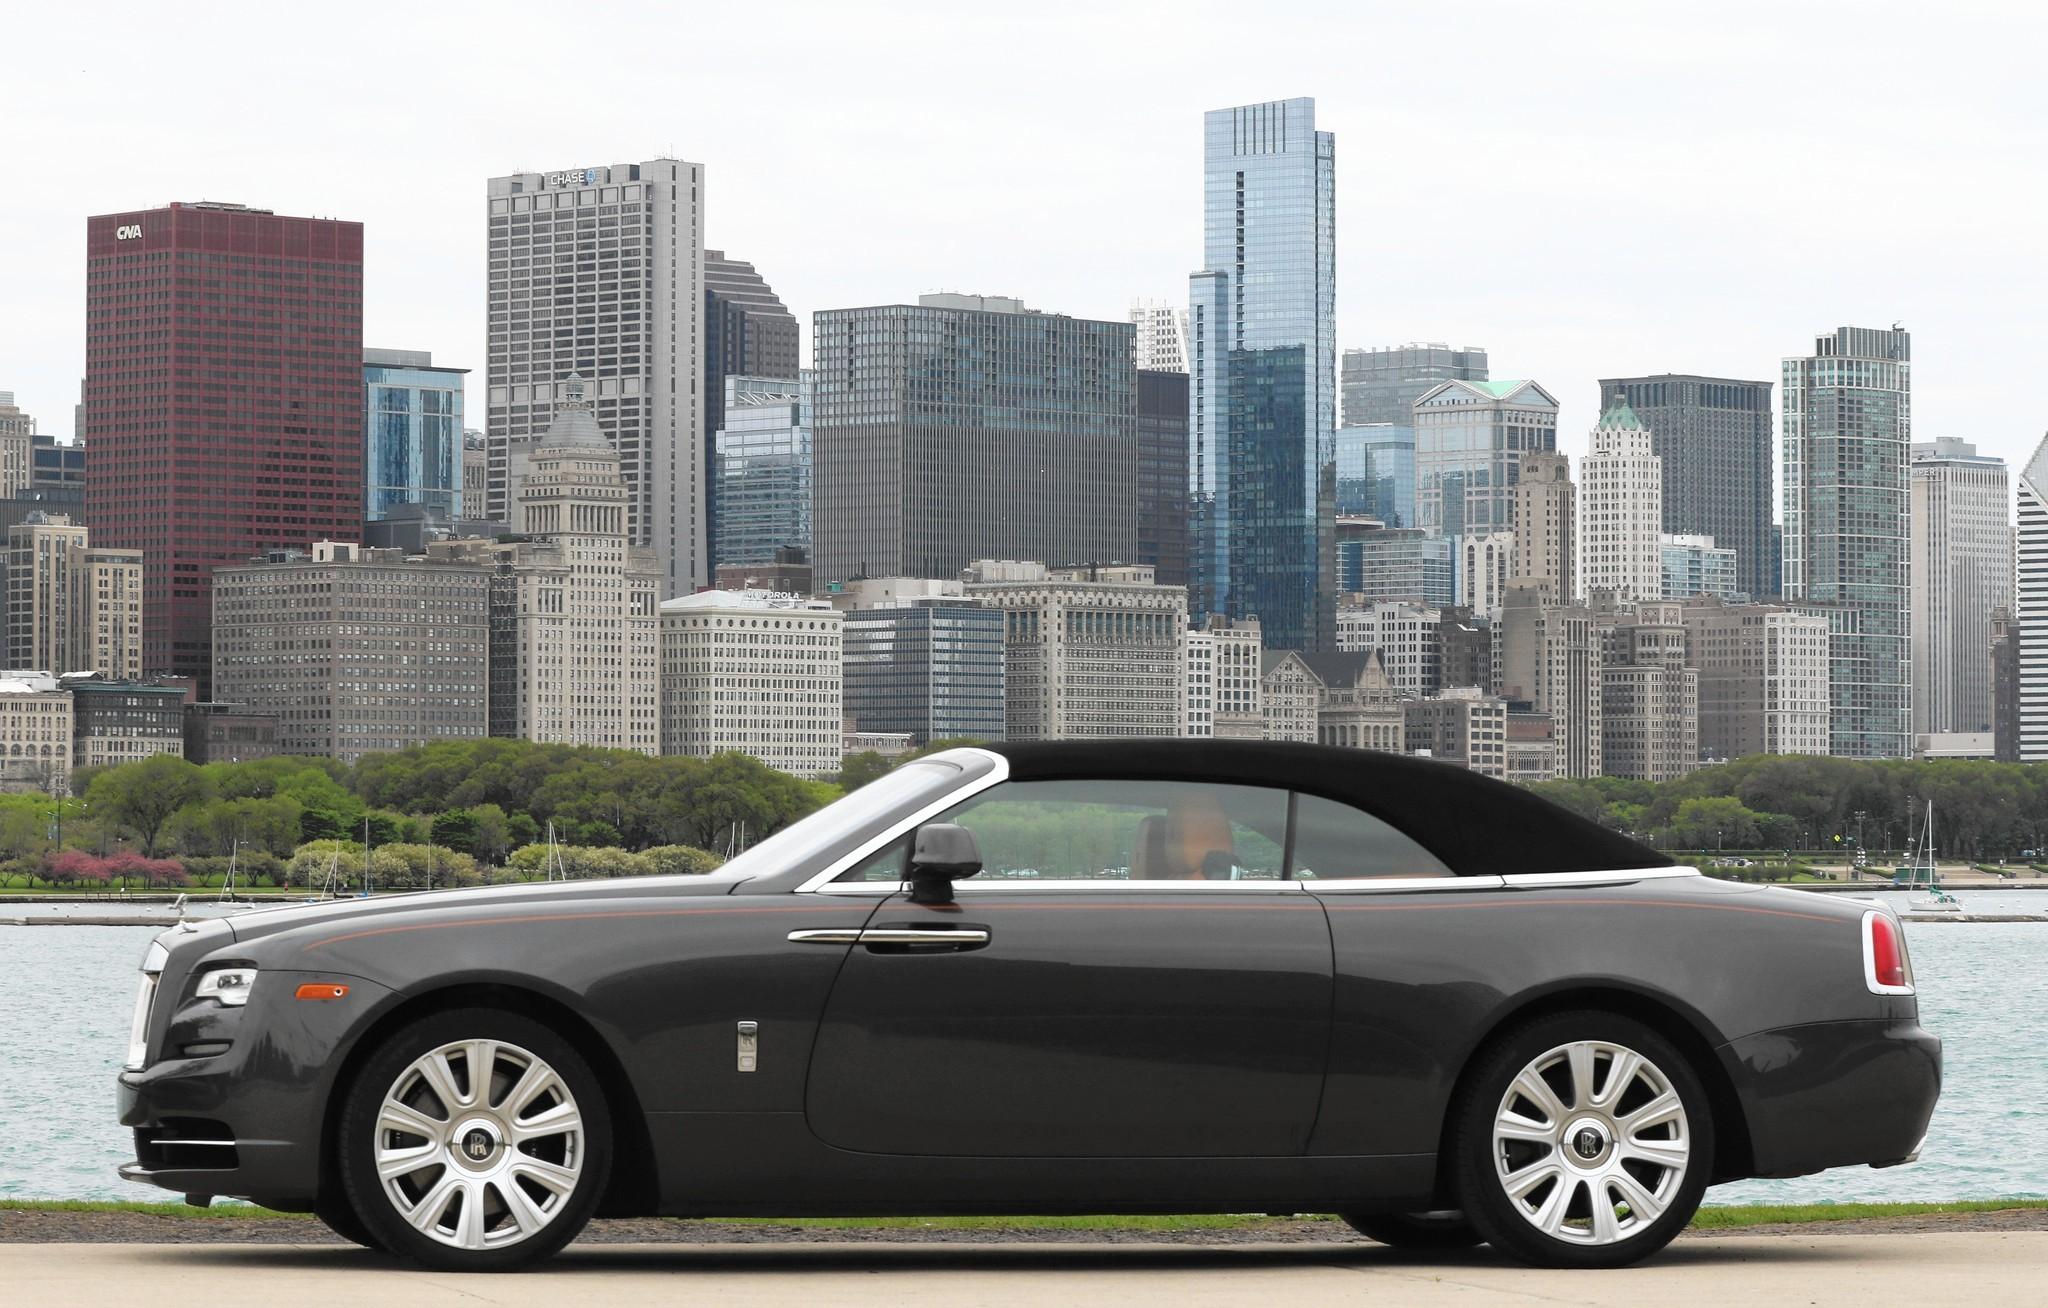 rolls royce dawn dark blue. Rolls-Royce Dawn Delivers Everything In $400,000 Convertible - Chicago Tribune Rolls Royce Dark Blue